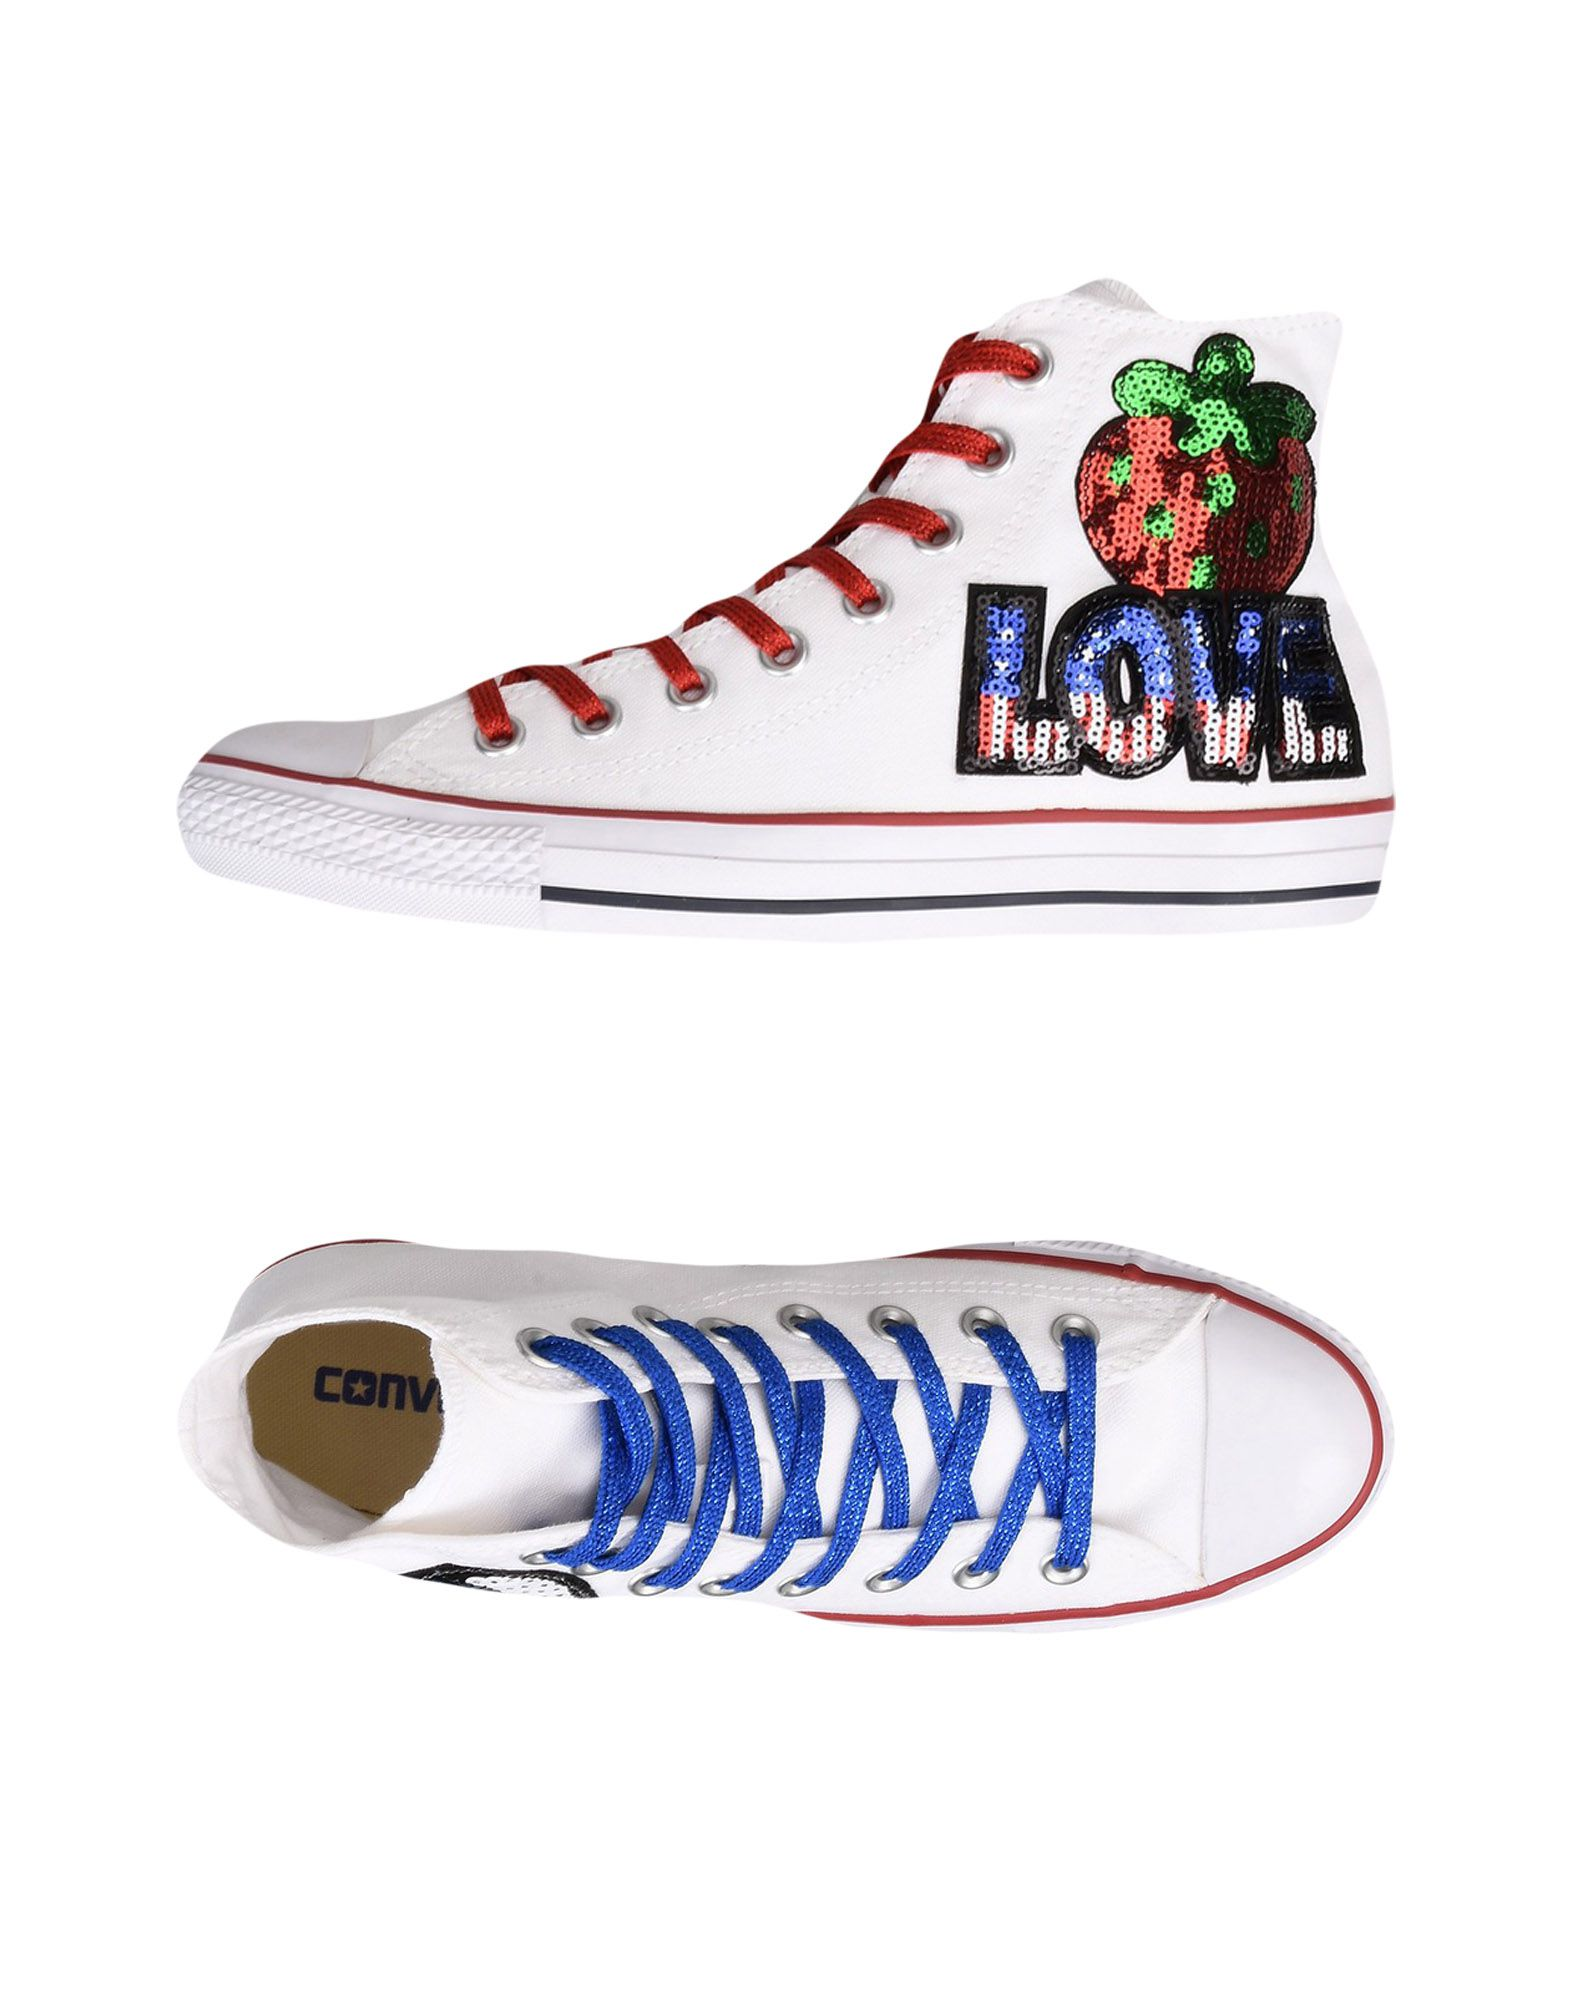 eeb004c51696 Converse Limited Edition Ctas Hi Canvas Ltd Ltd Ltd - Sneakers - Women  Converse Limited Edition Sneakers online on United Kingdom - 11274392JE  64bb57